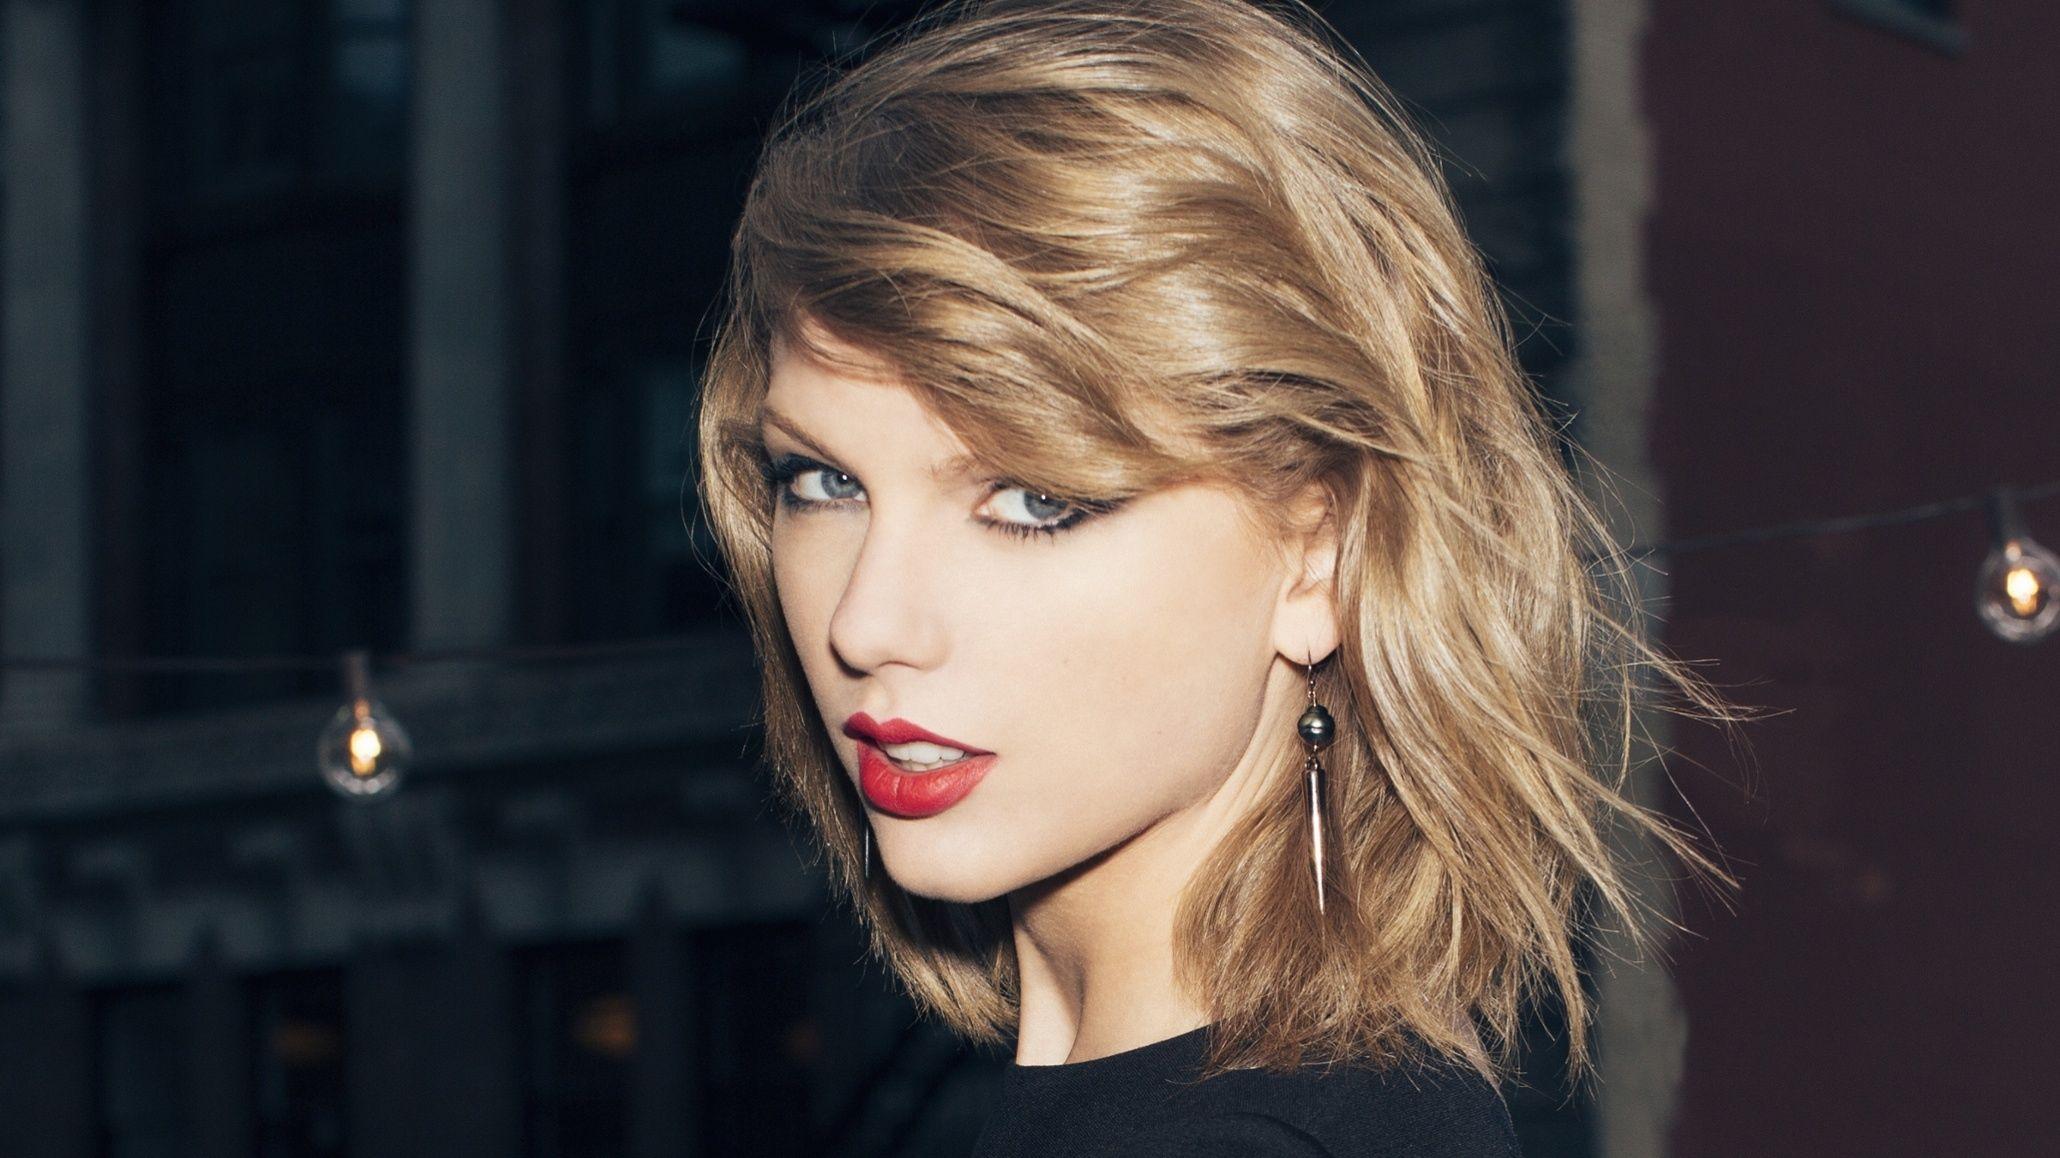 Taylor Swift won't put 1989 on Apple Music | T3